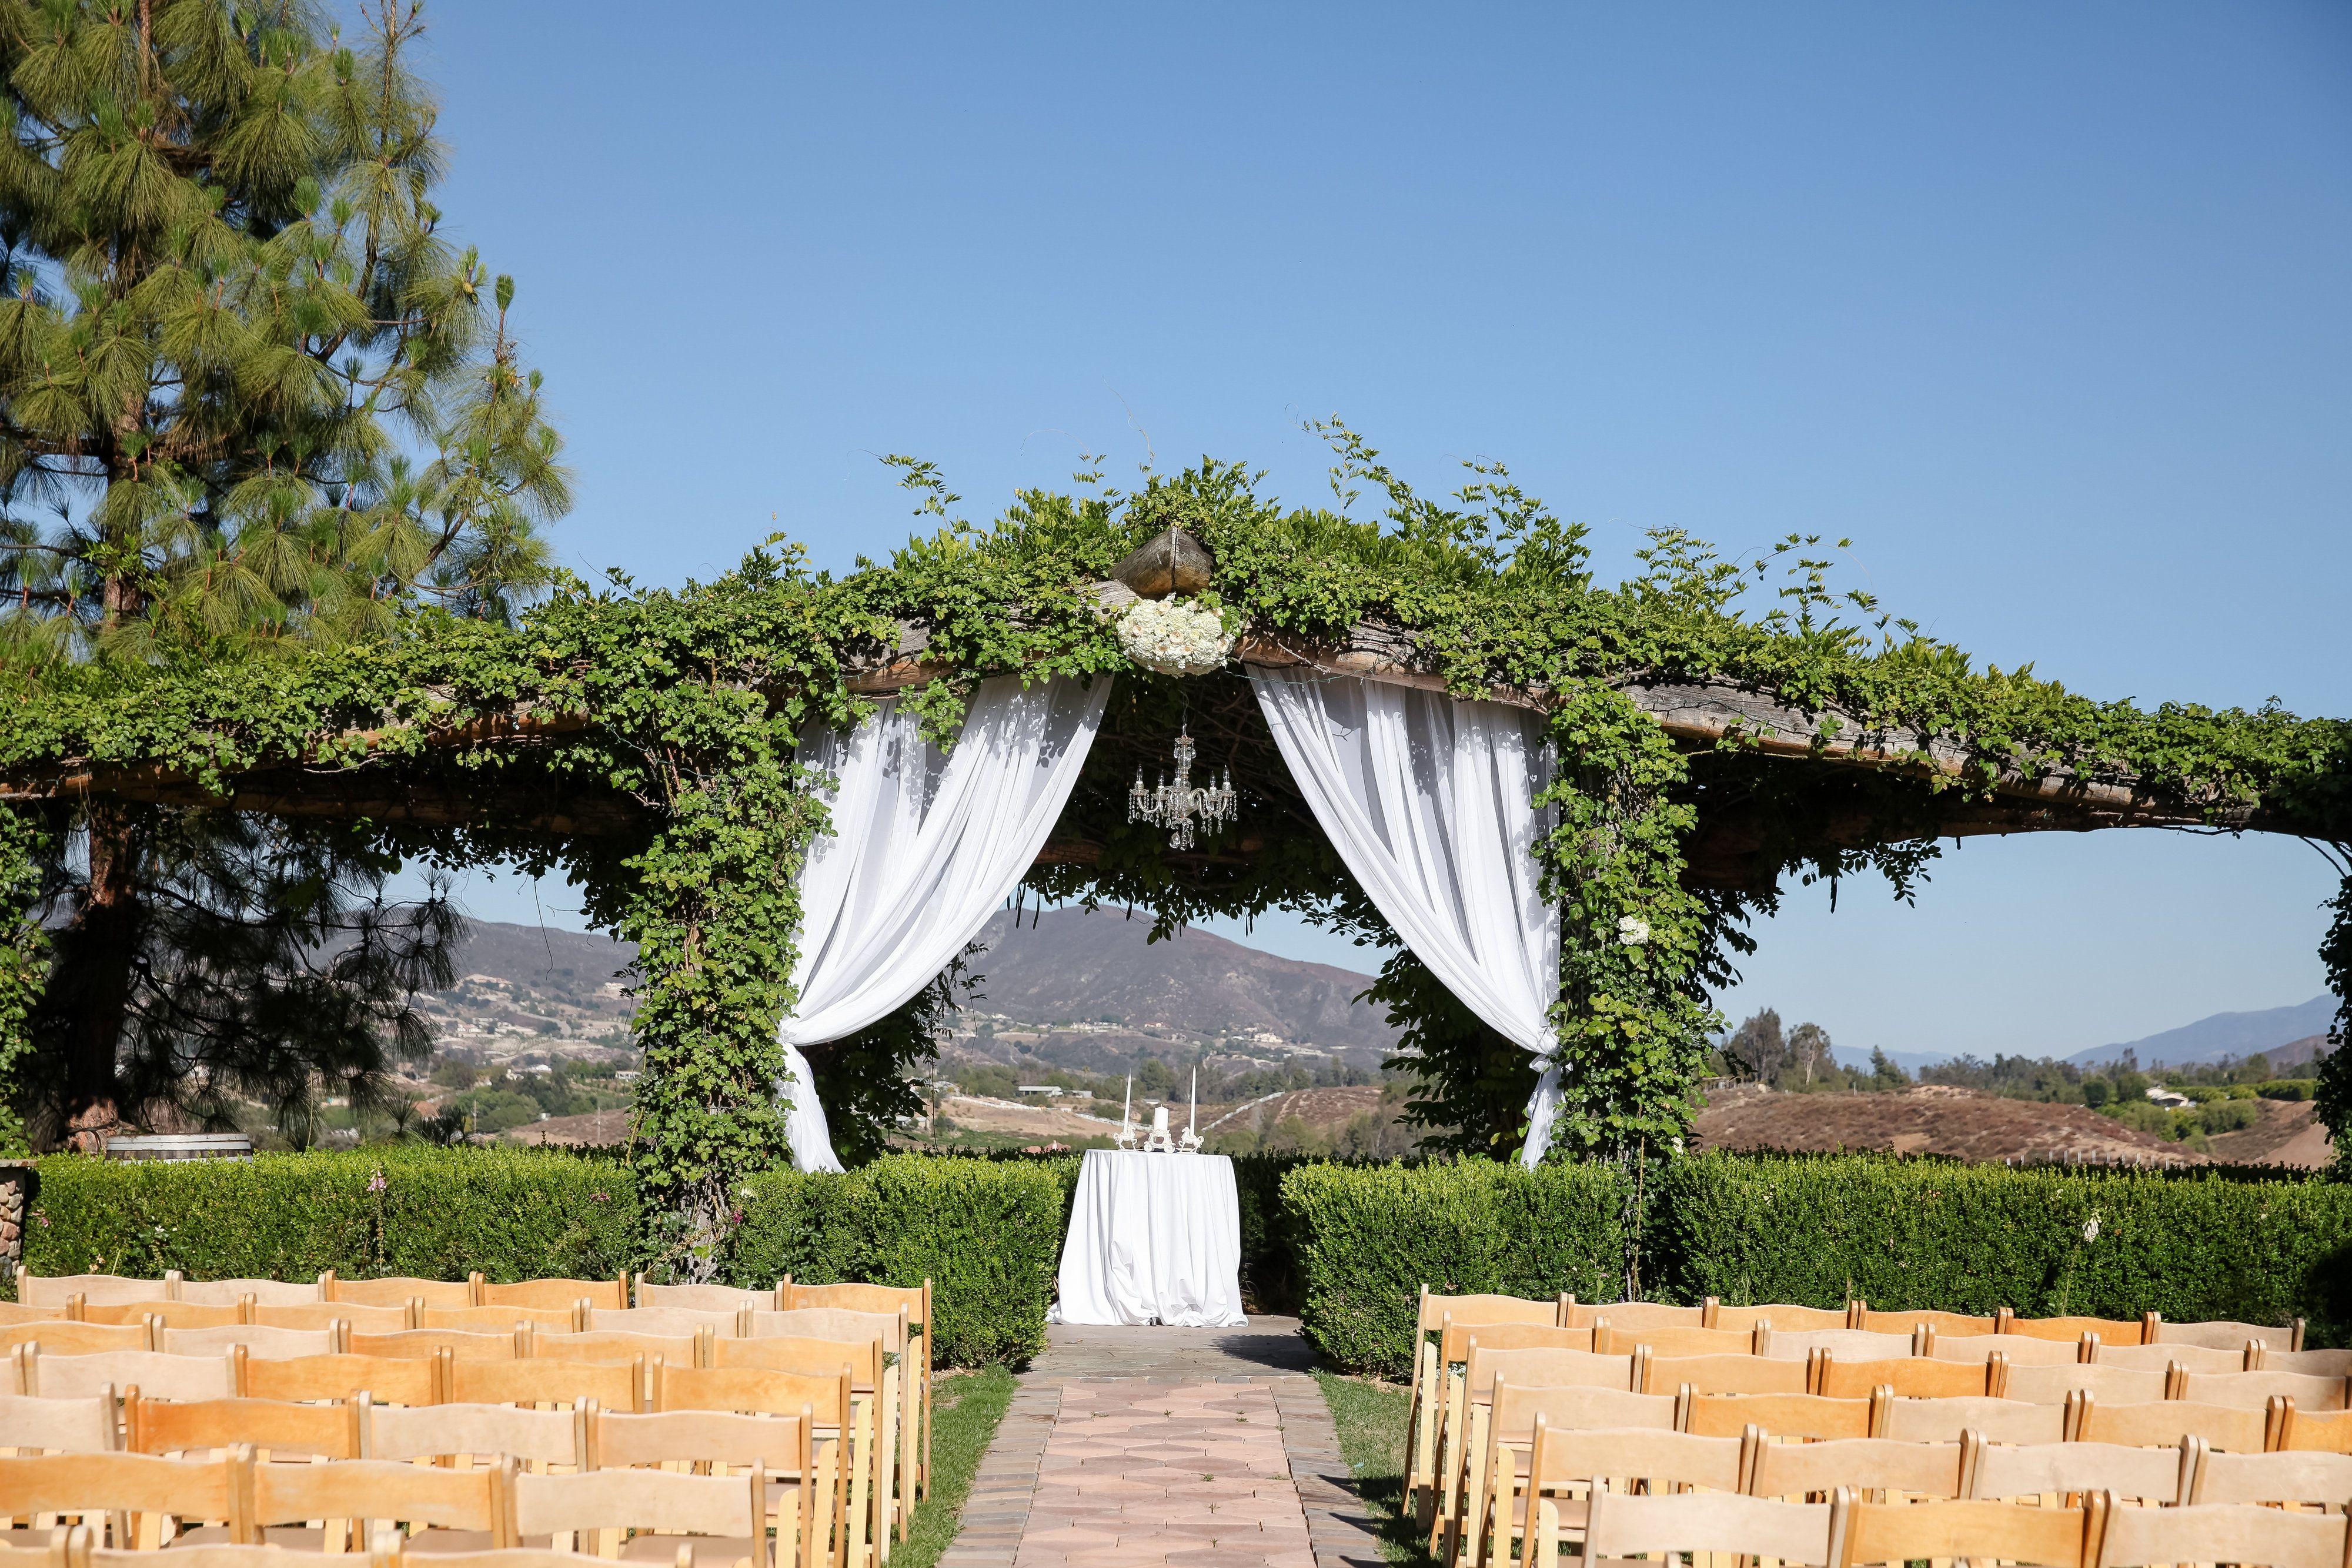 18+ Temecula wedding venue prices information